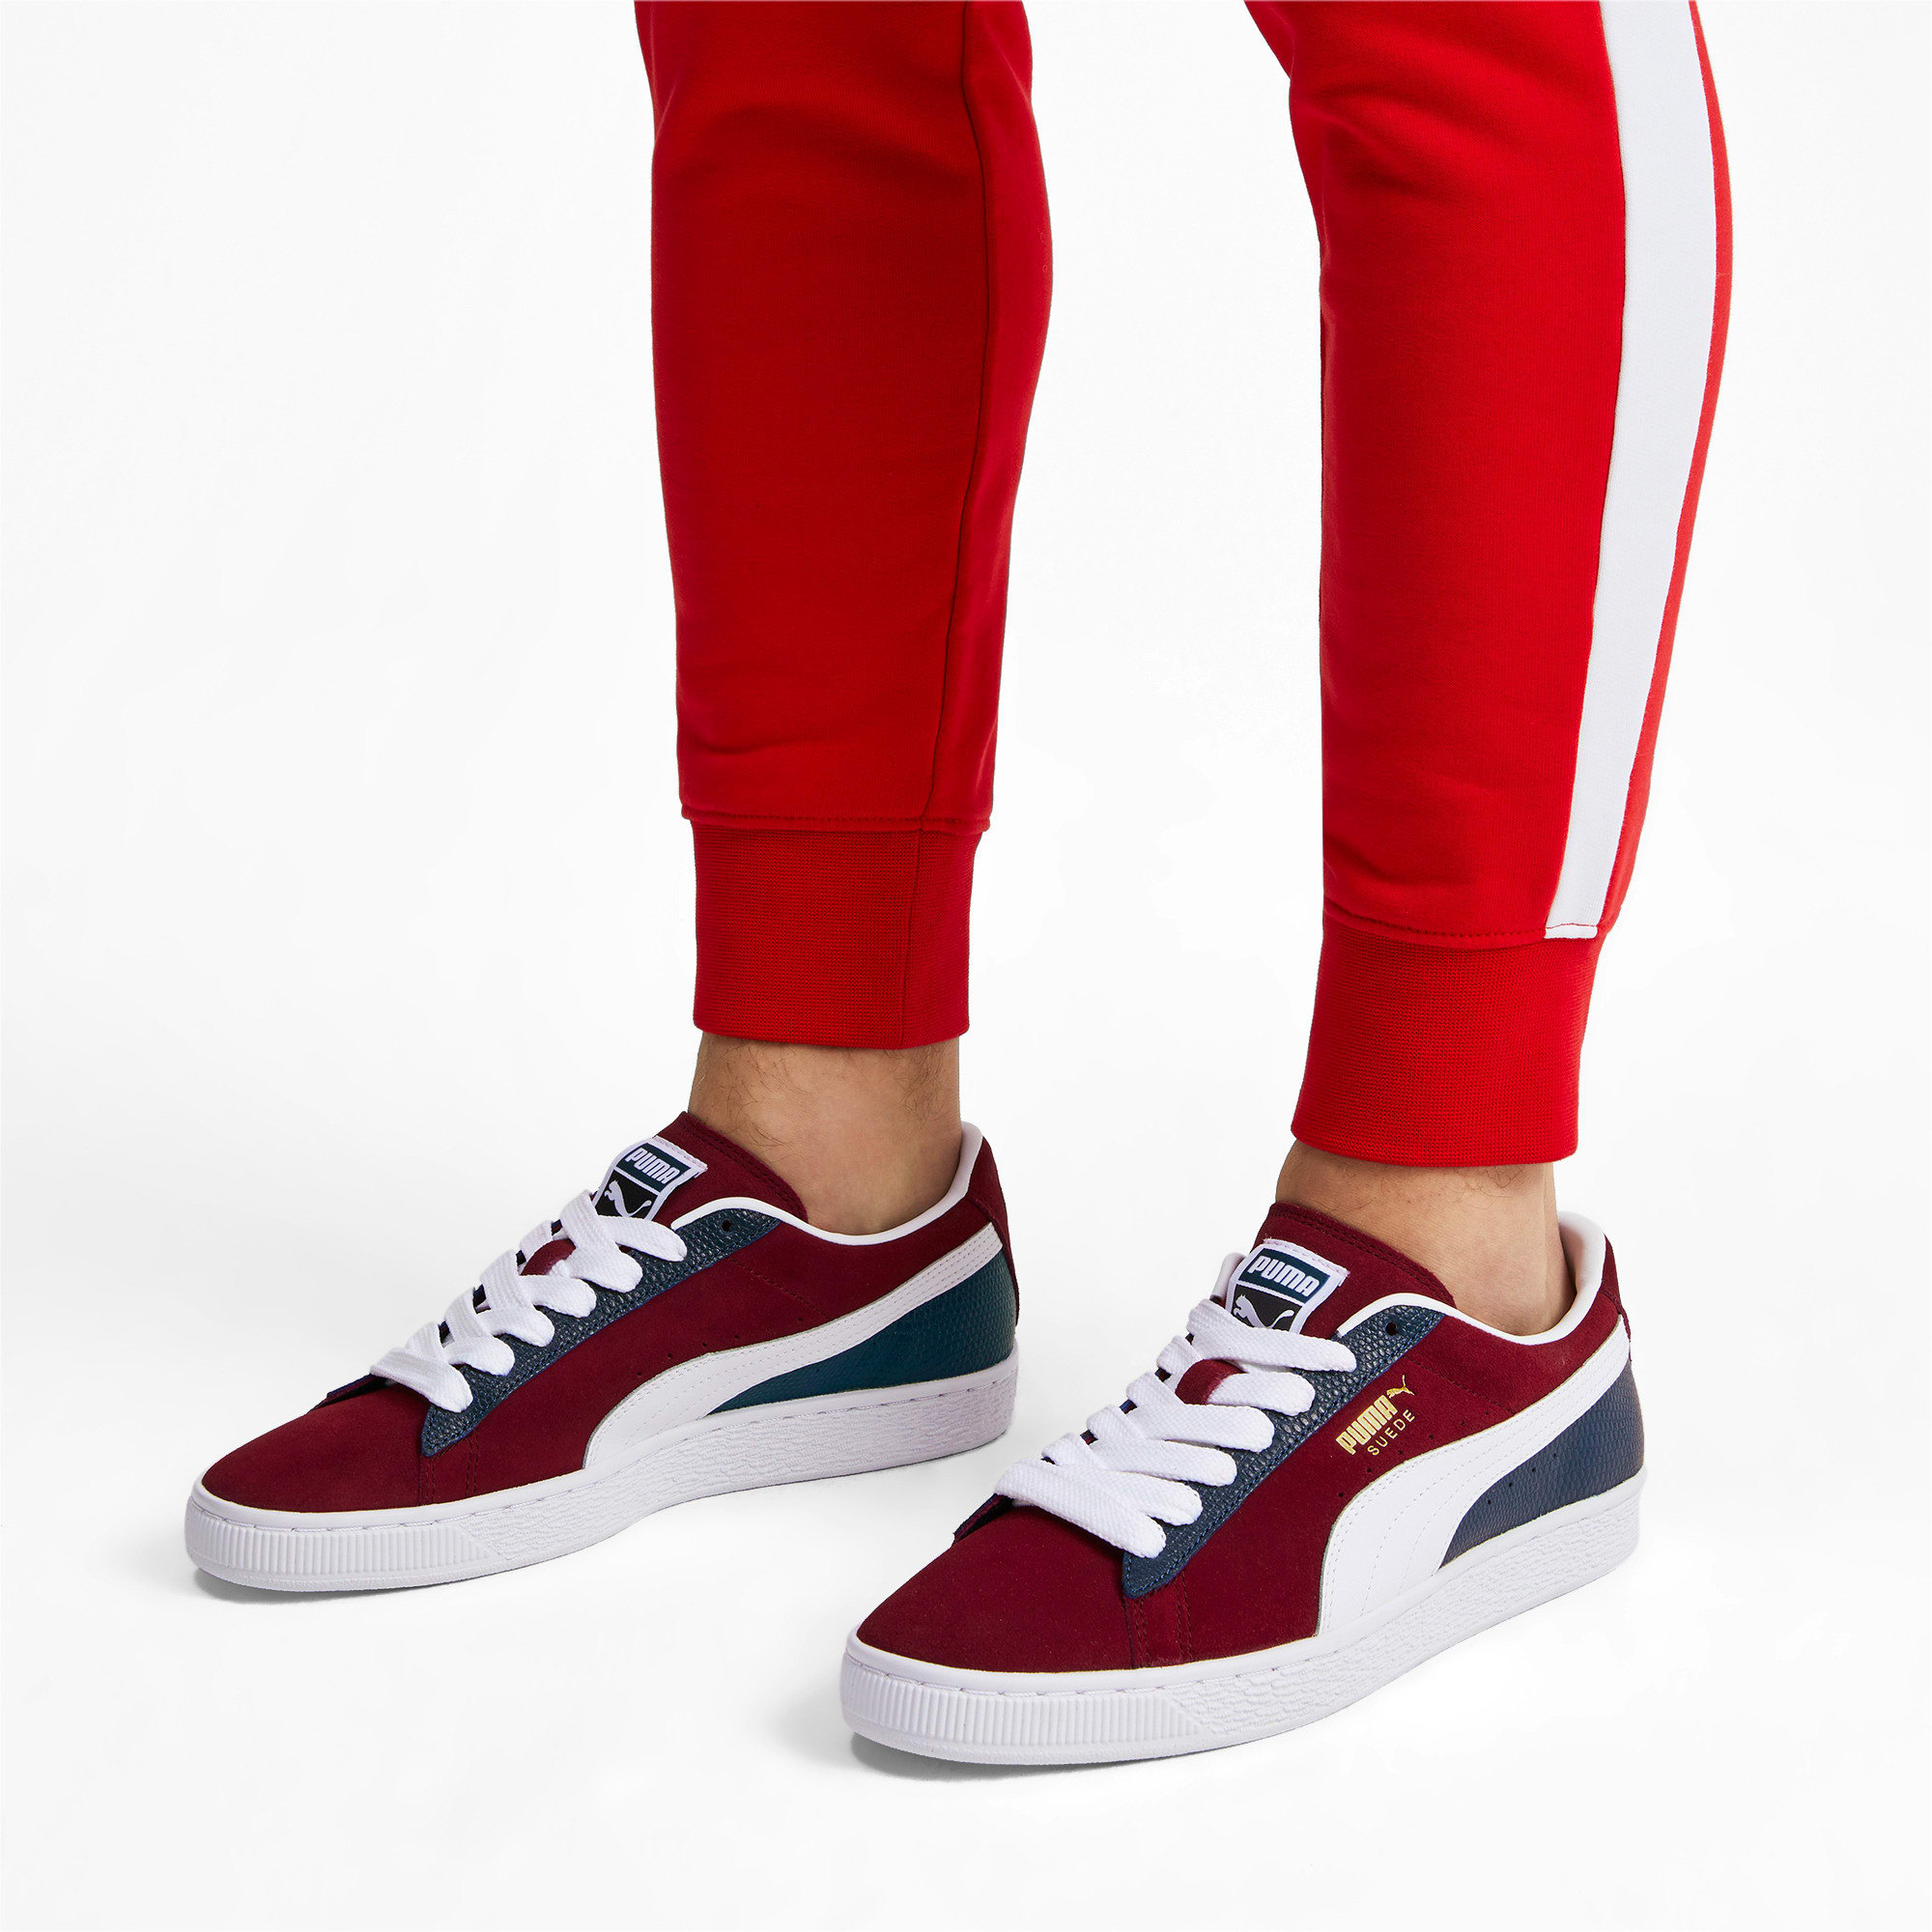 Thumbnail 3 of Suede Classic Block Sneakers, Rhubarb- Blue-White, medium